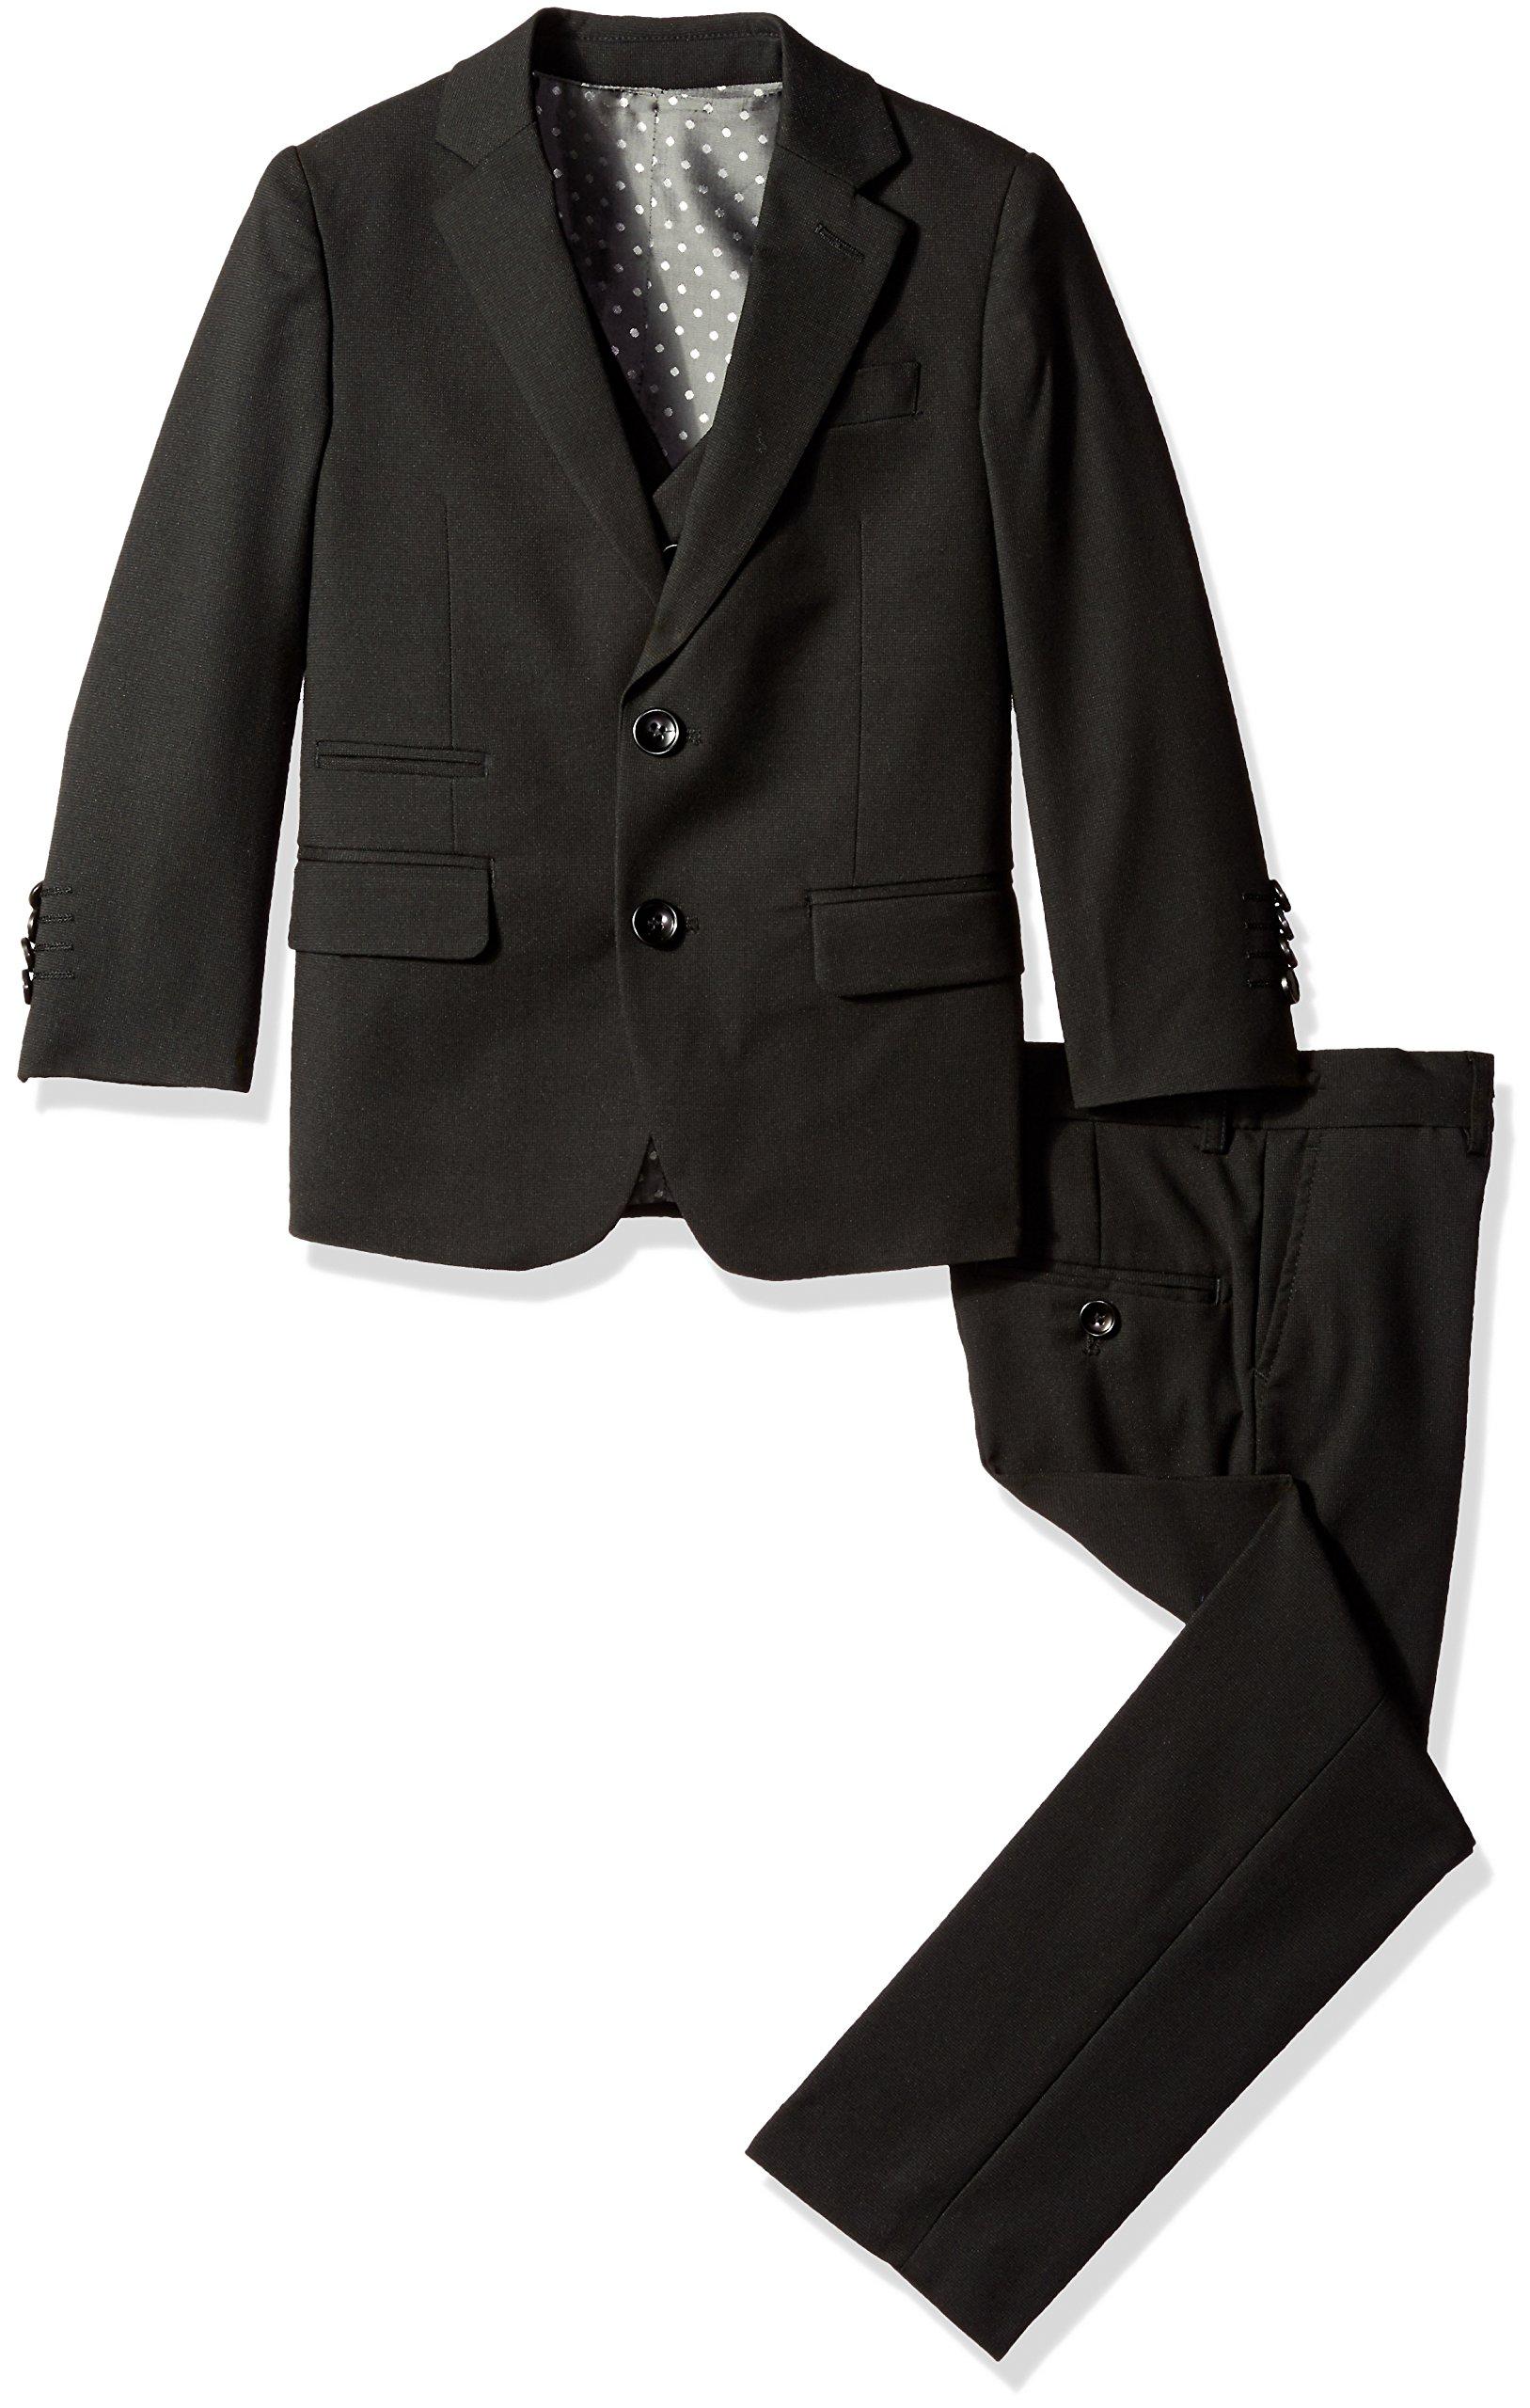 Isaac Mizrahi Boys' Big 3 Piece Two Button Birdseye Suit Set, Black, 10